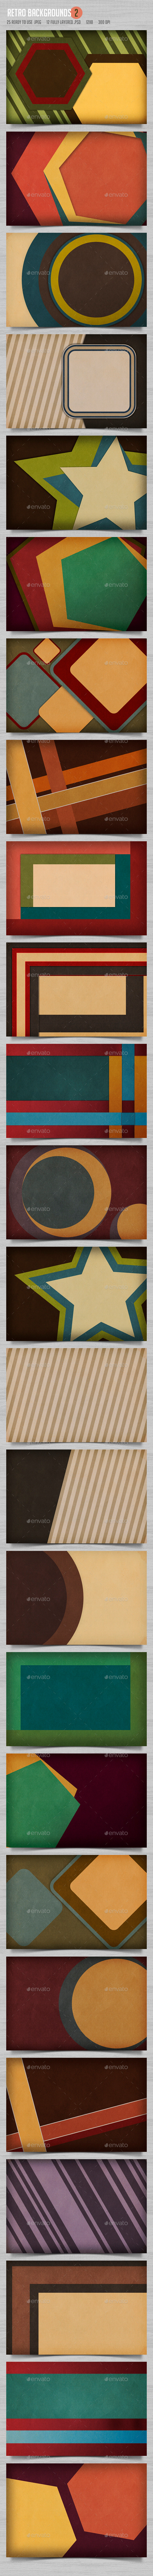 GraphicRiver Retro Backgrounds 2 11652230